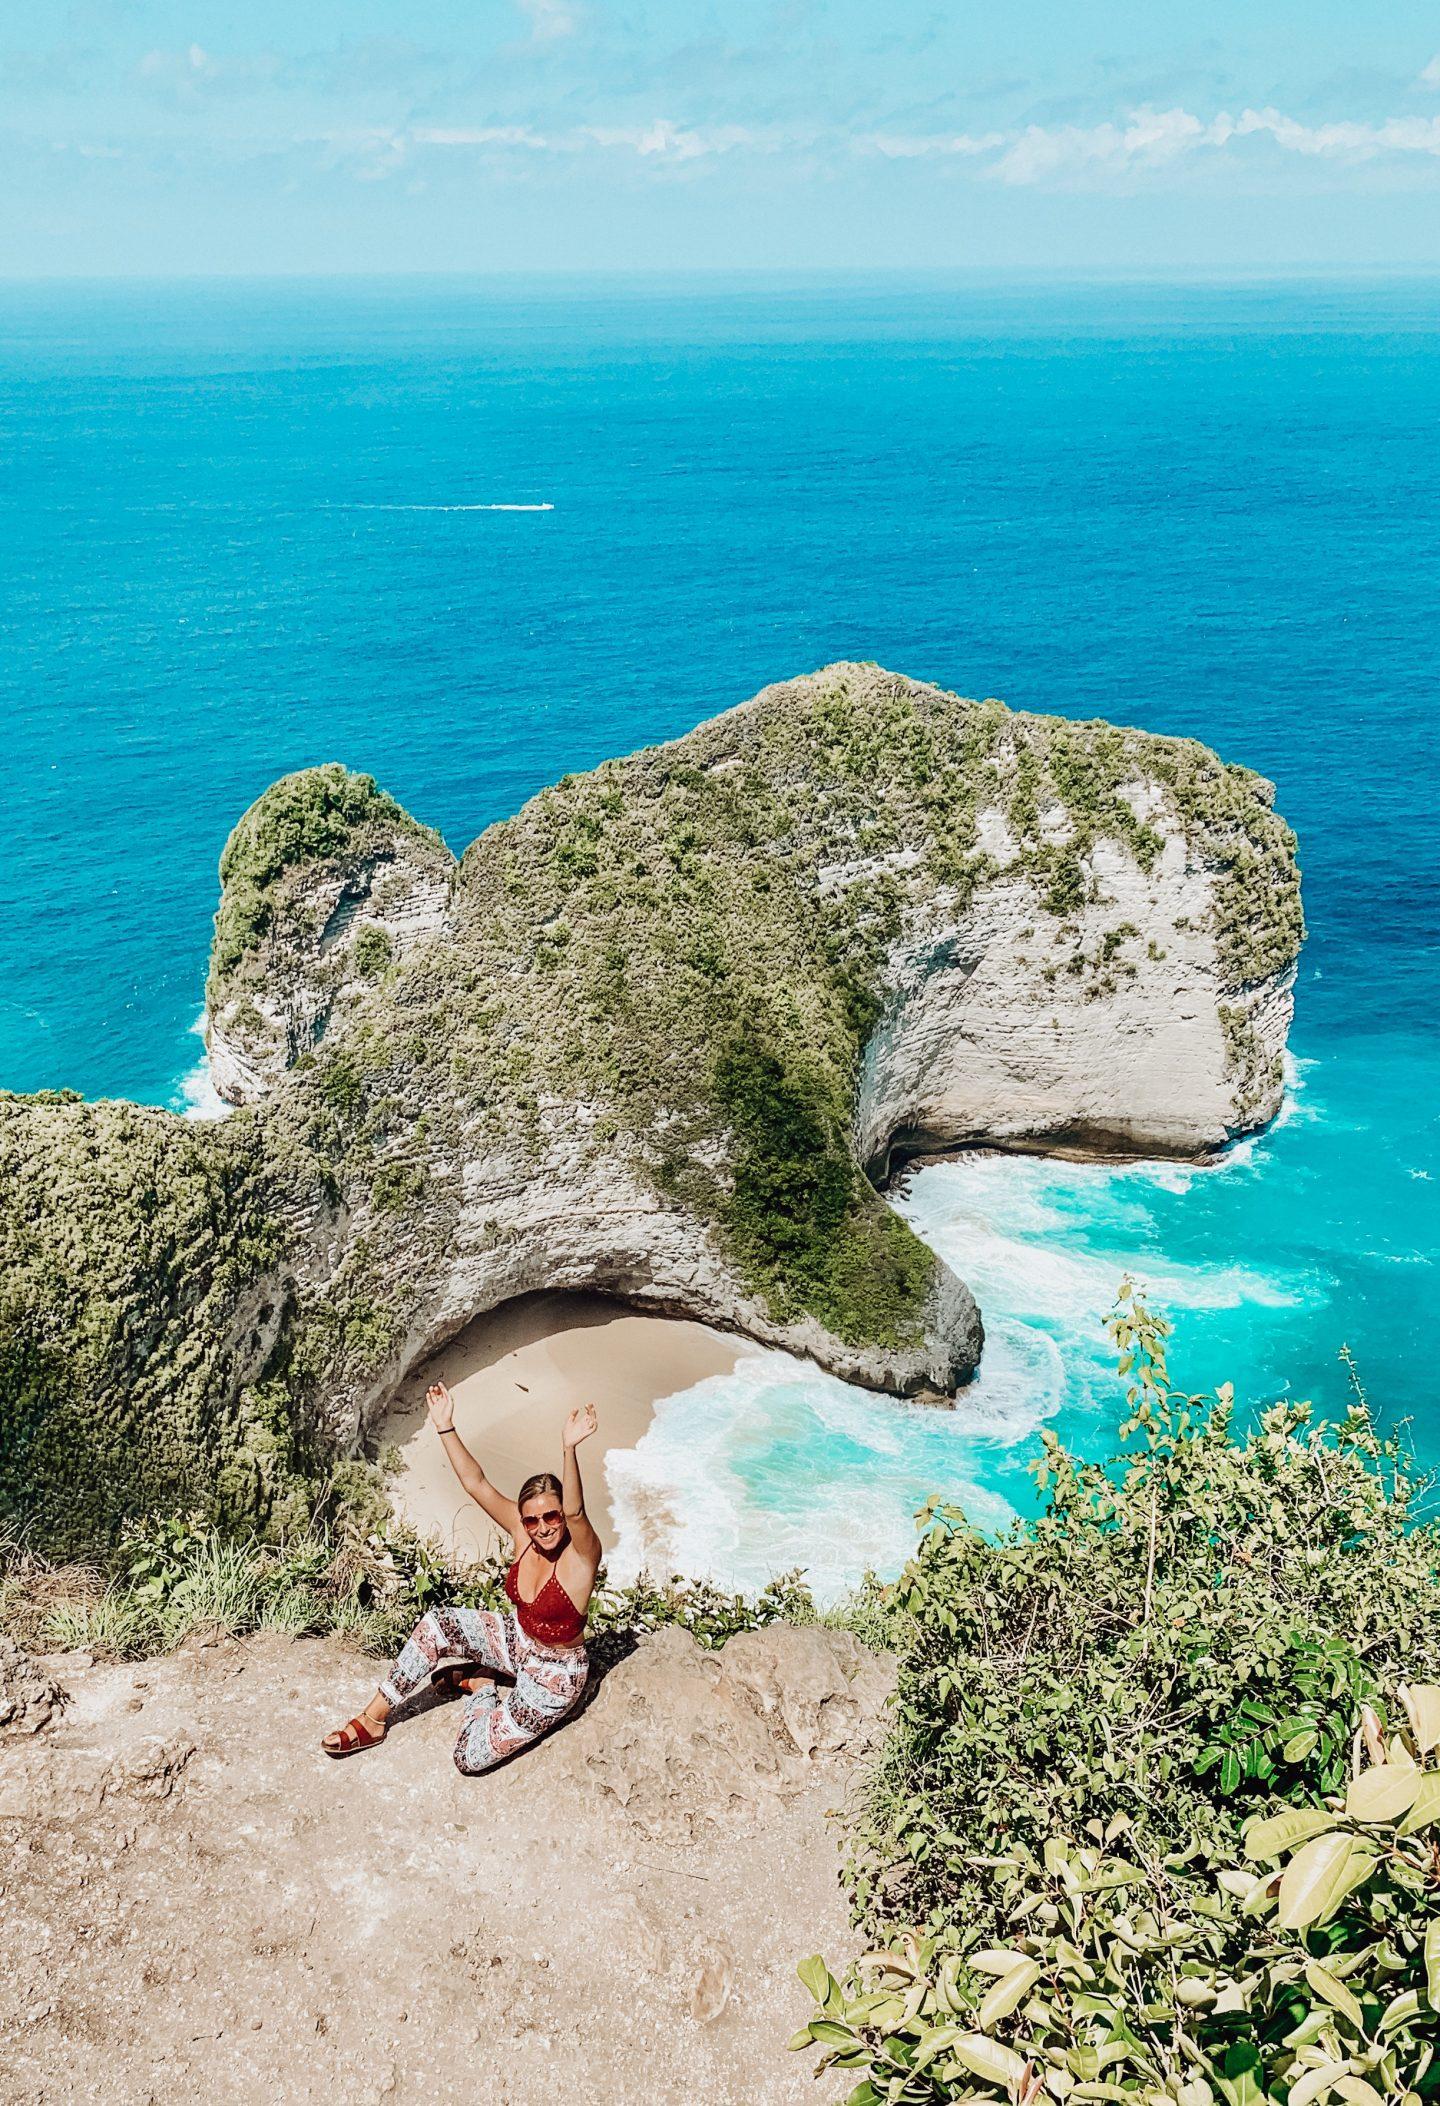 View of me looking down to Klingking Beach on Nusa Penida Island